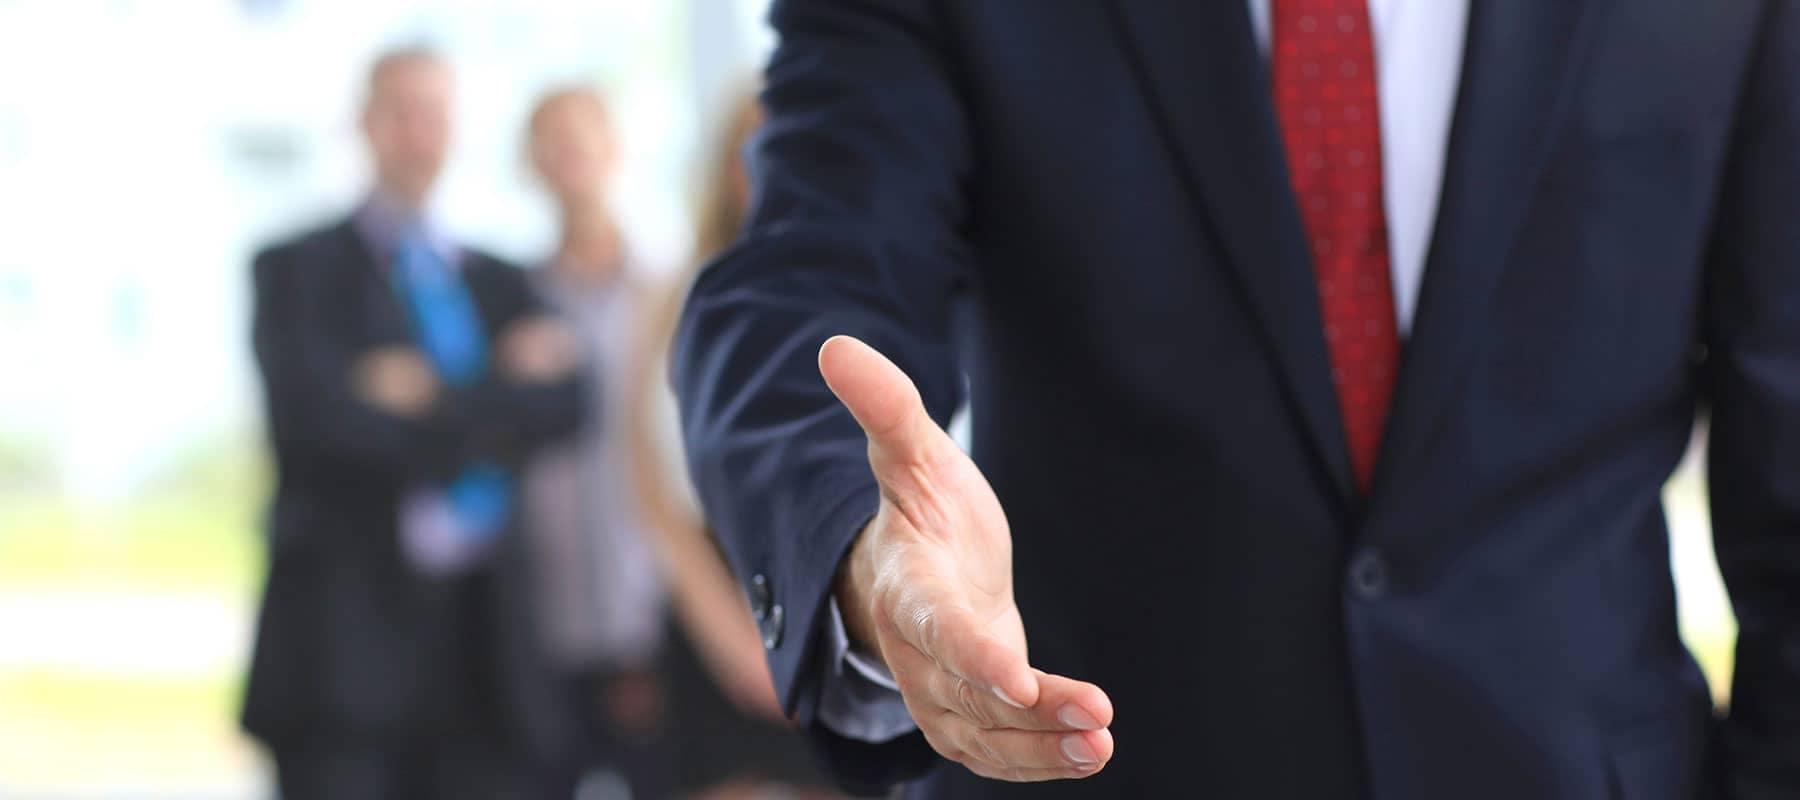 Person in suit extending hand for handshake